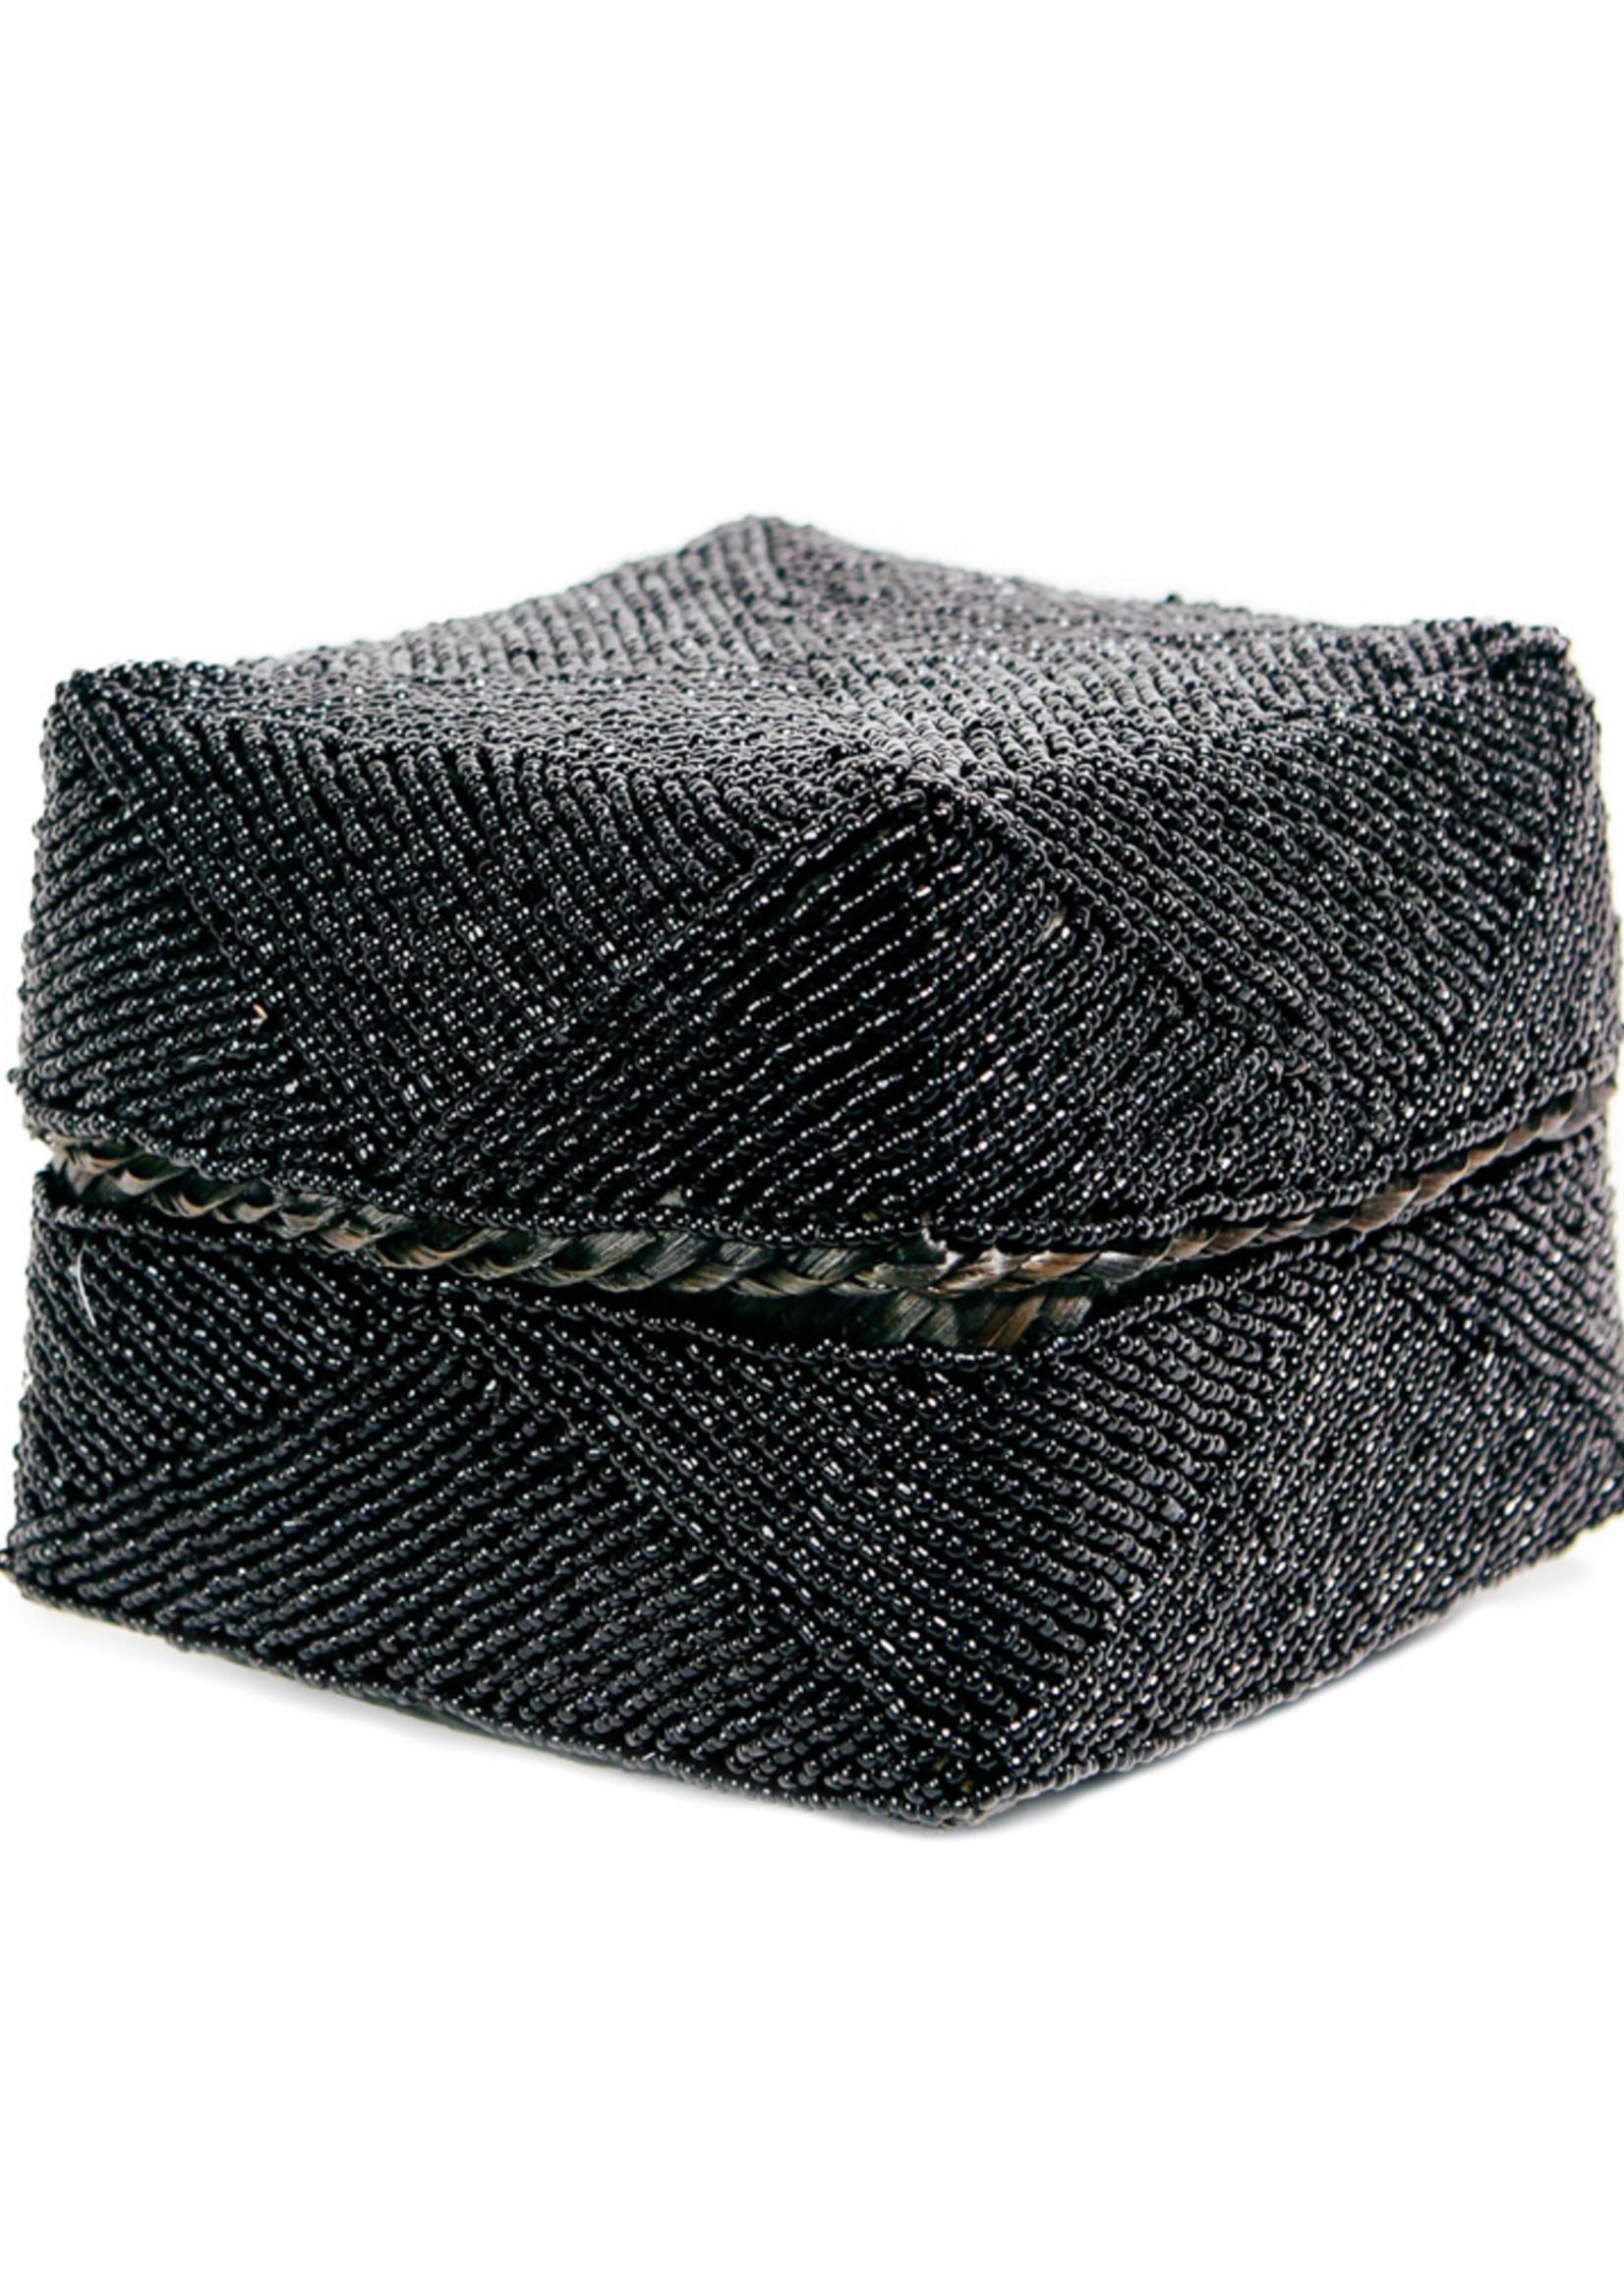 The Beaded Basket - Black - L